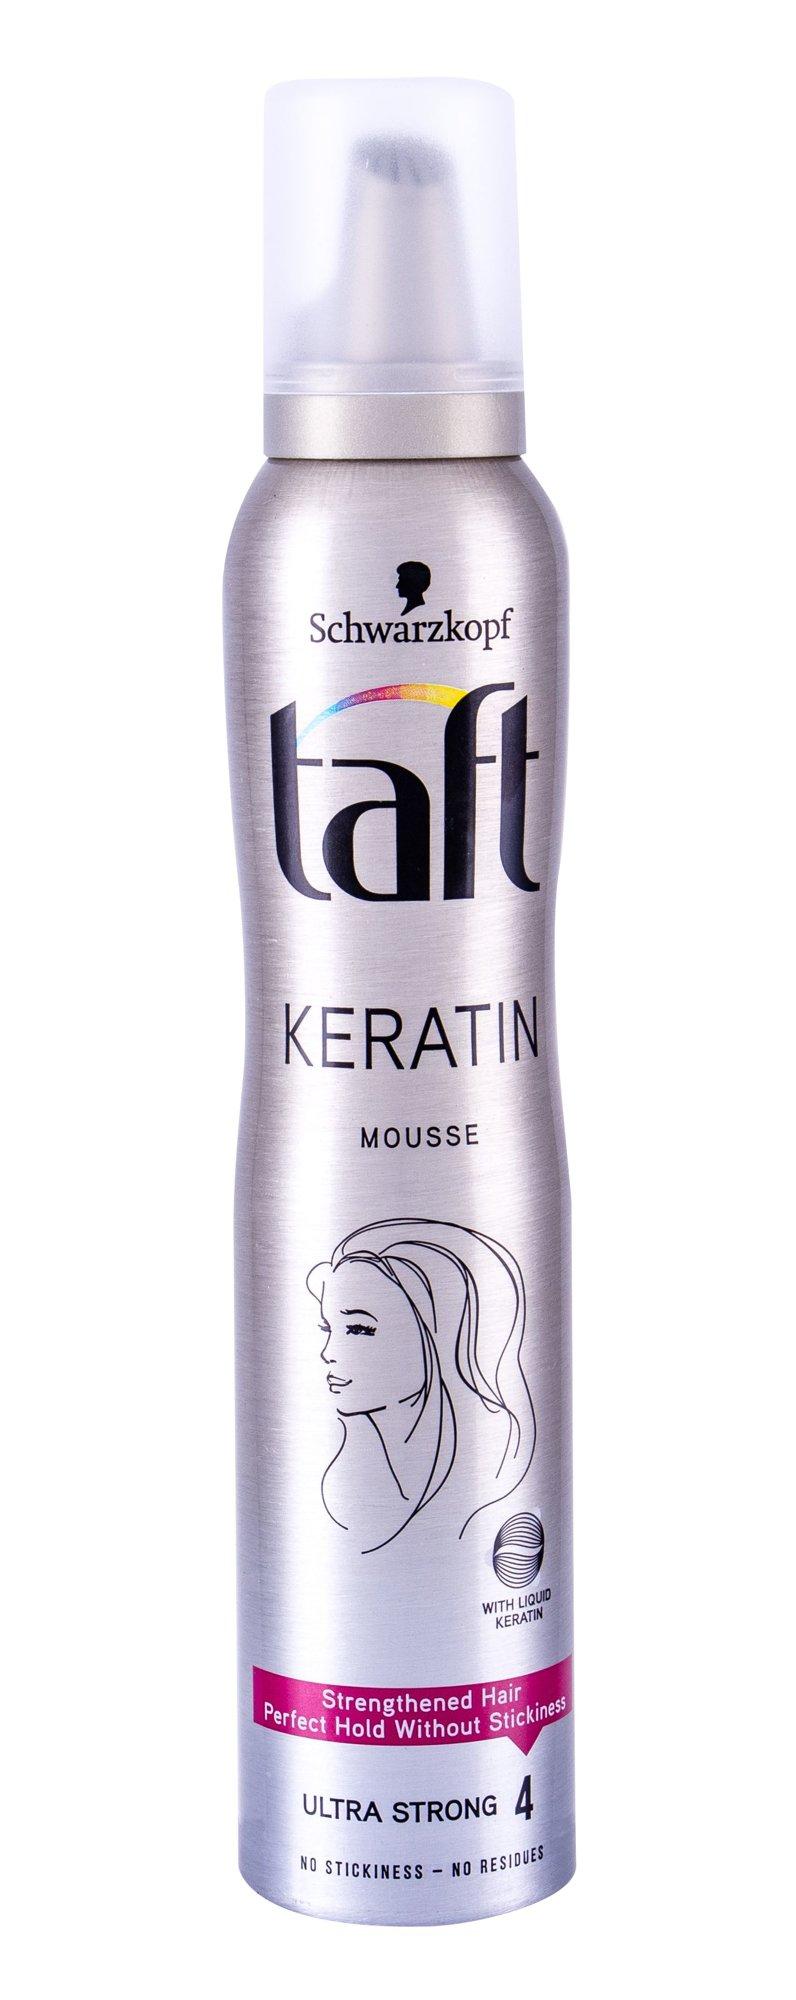 Schwarzkopf Taft Keratin - tužidlo na vlasy W Objem: 200 ml